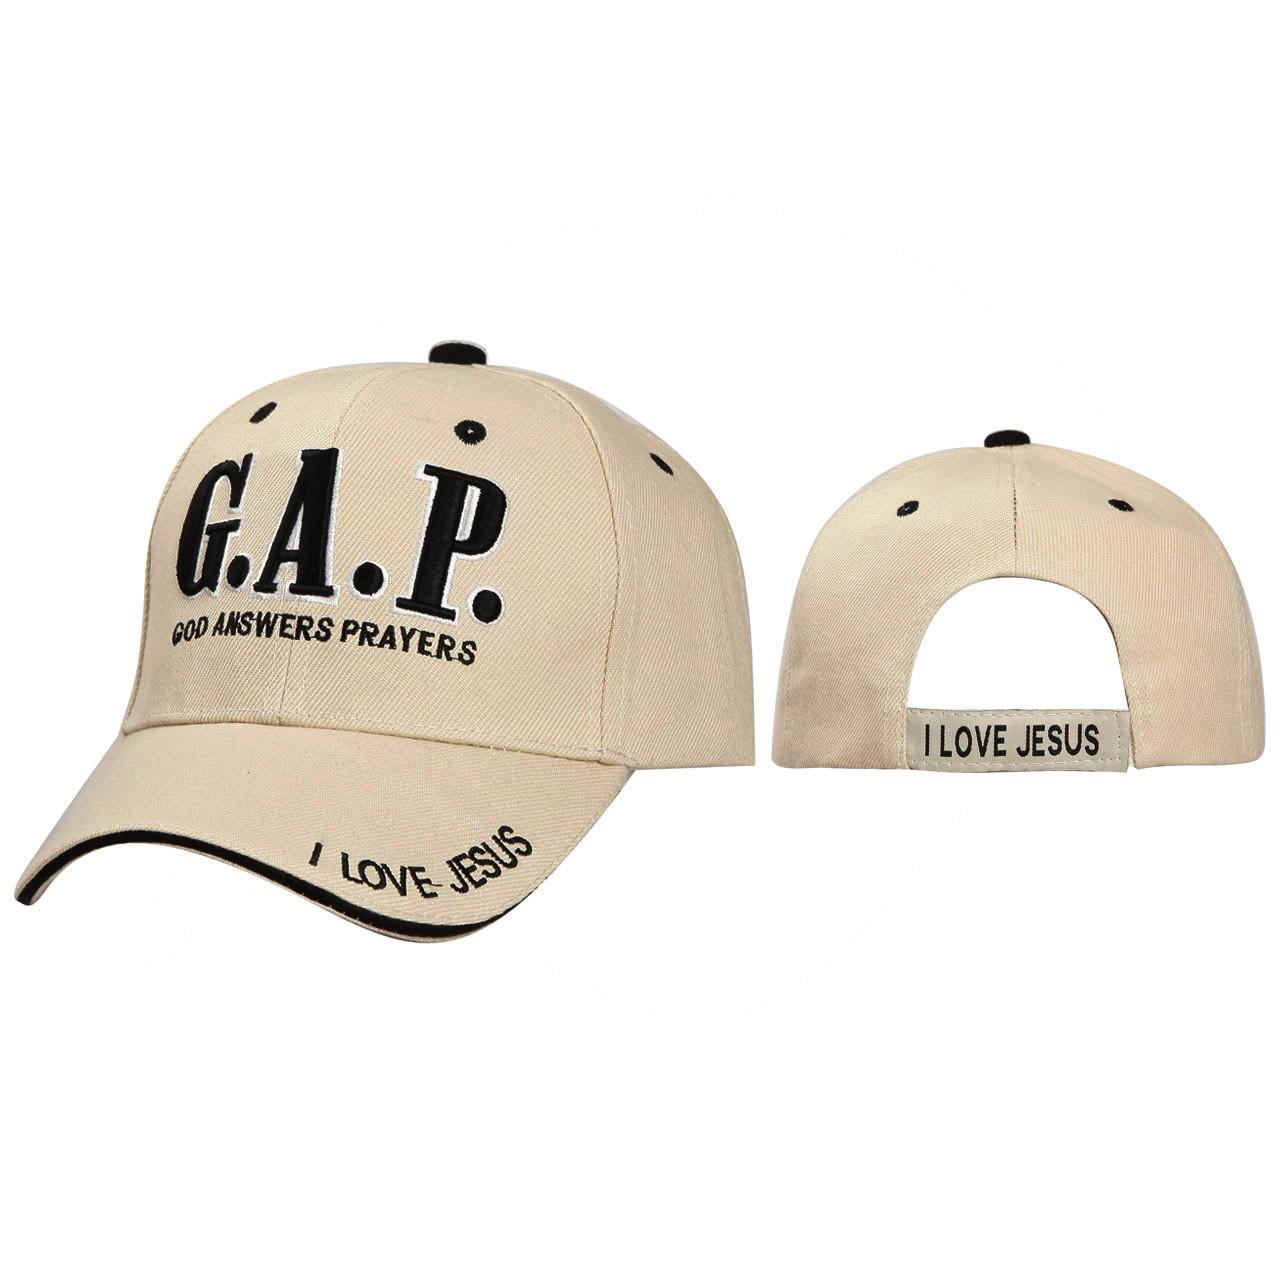 Wholesale Baseball Cap C114 (1 pc.) G.A.P. Christian Cap